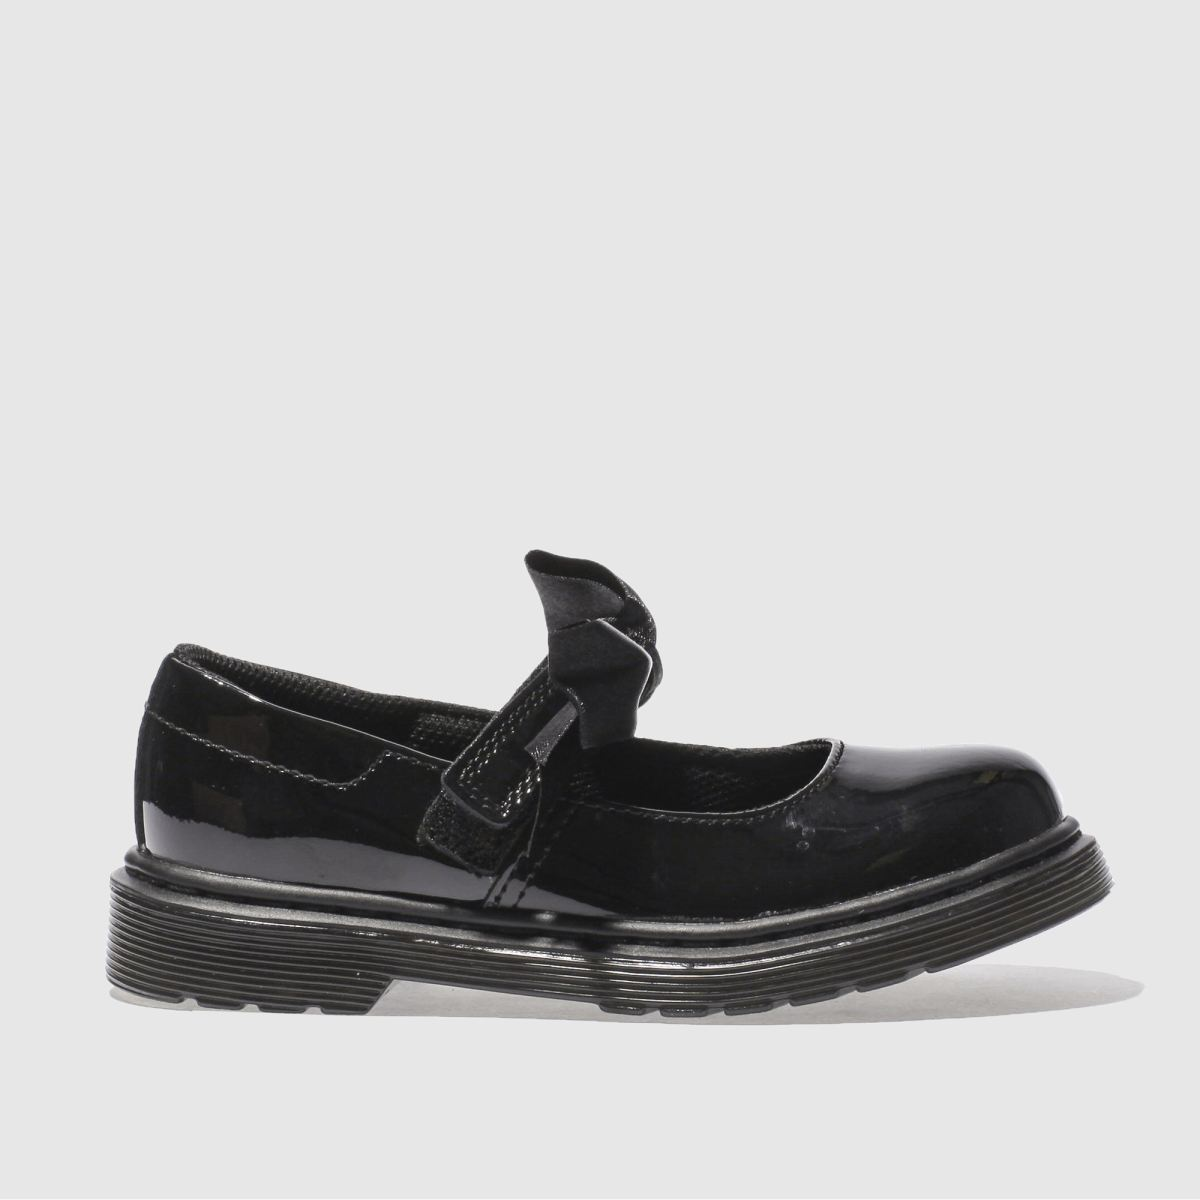 Dr Martens Black Maccy Ii Girls Junior Shoes